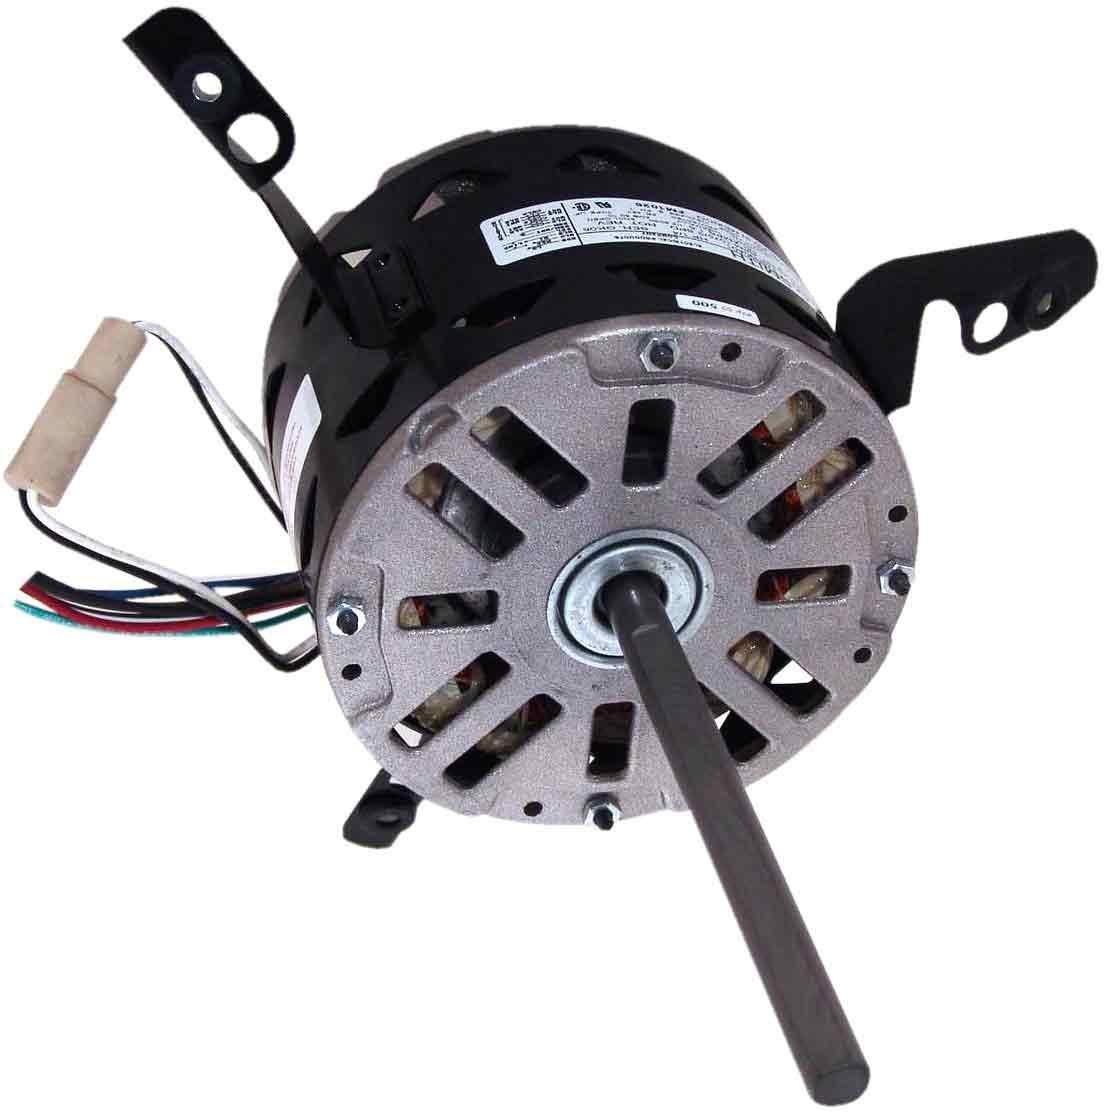 Century FM1026 Fleximount, 5.6-Inch Frame Diameter, 1/4-HP, 1075-RPM, 208-230-Volt, 1.4-Amp, Sleeve Bearing Motor